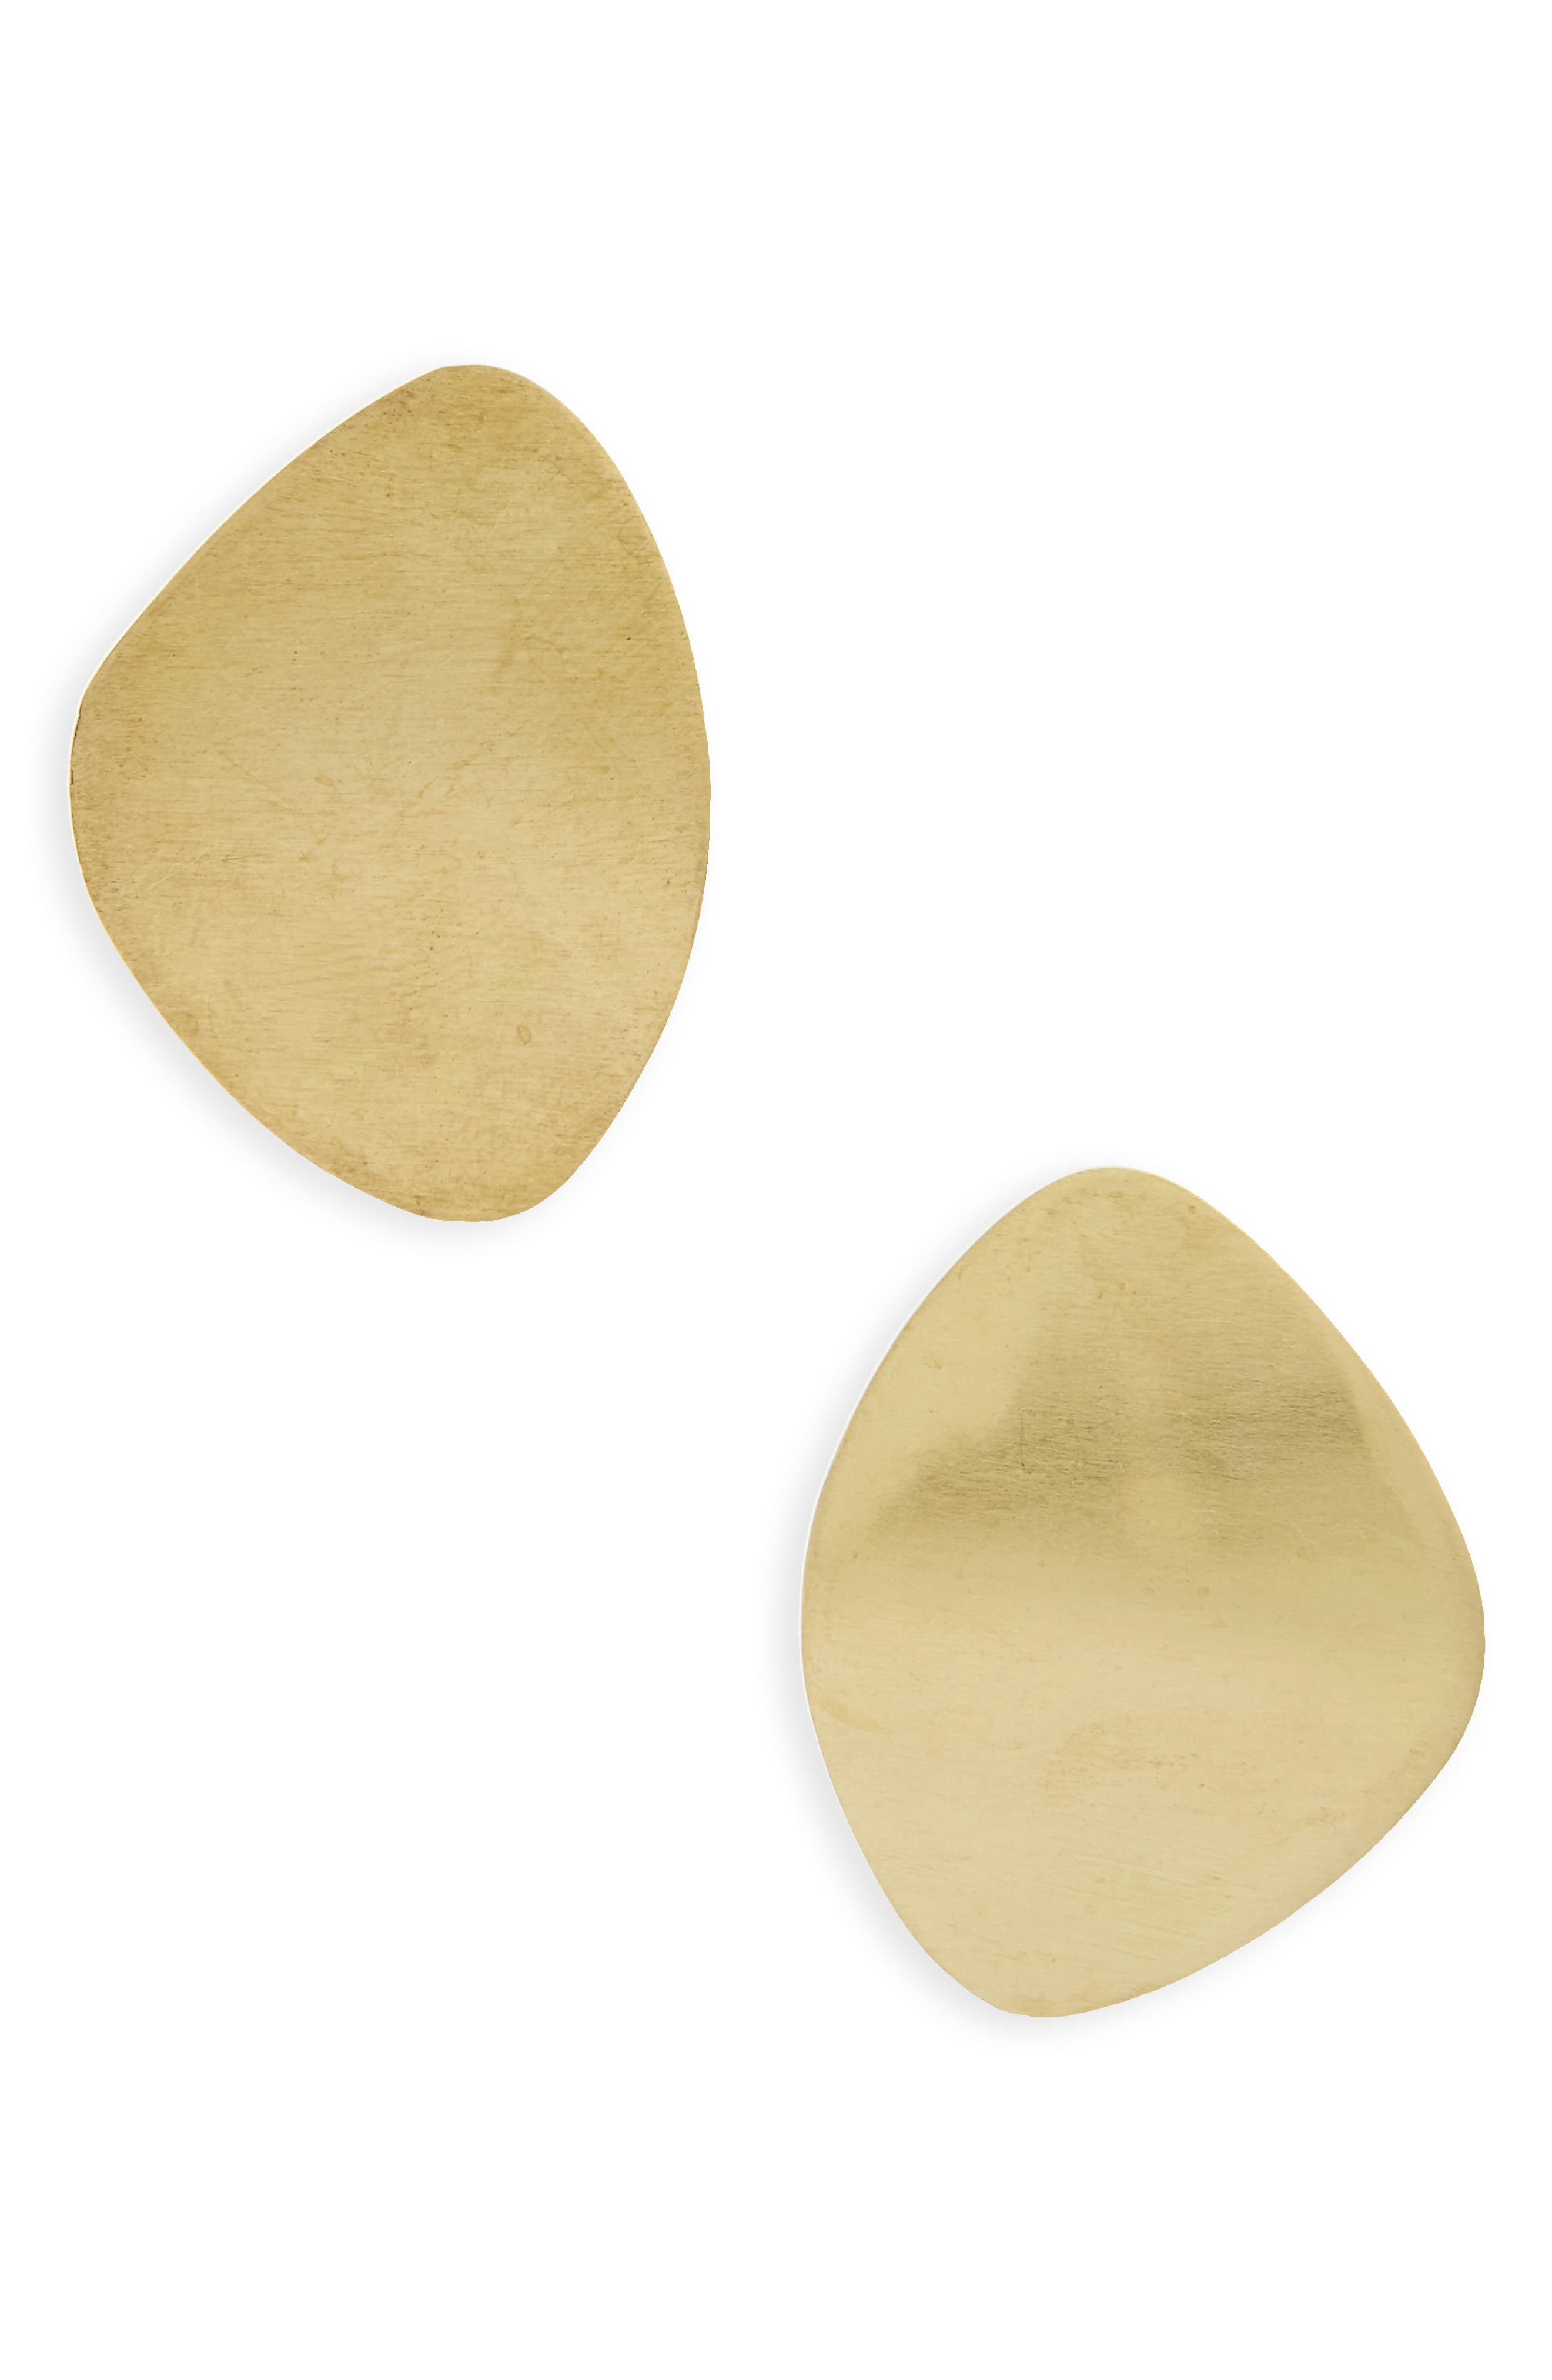 Sabi Large Stud Earrings,                         Main,                         color, 710